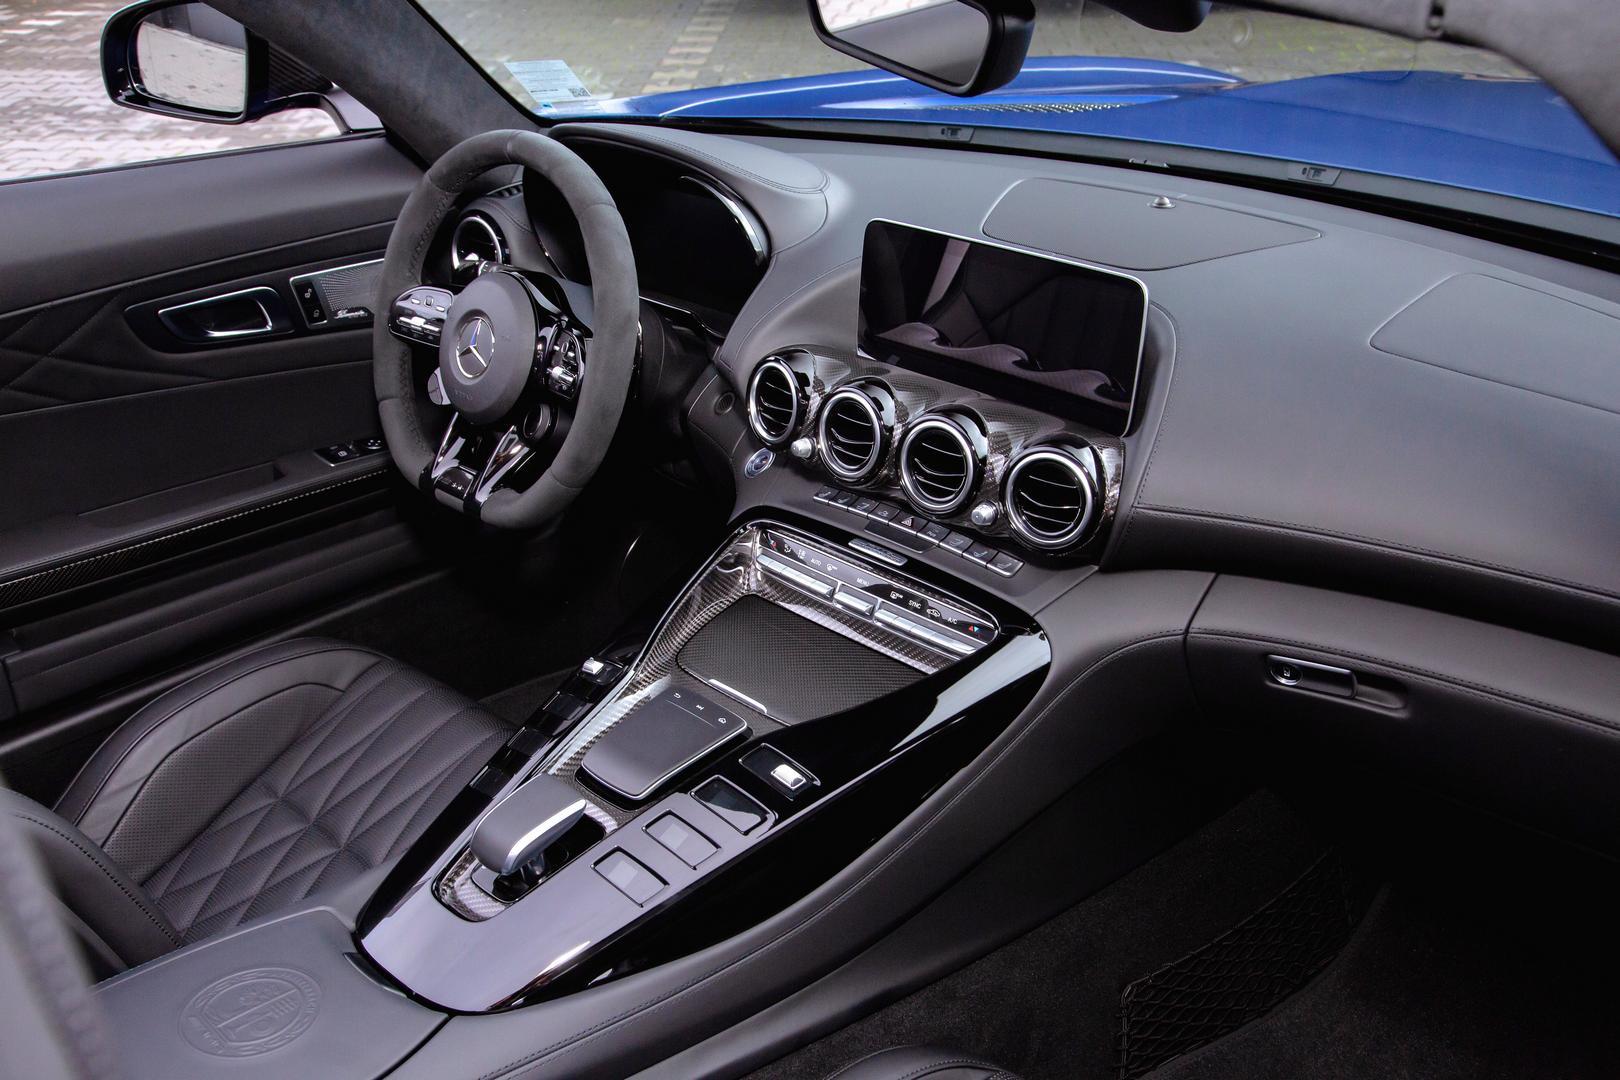 Mercedes-AMG GT R Roadster front interior